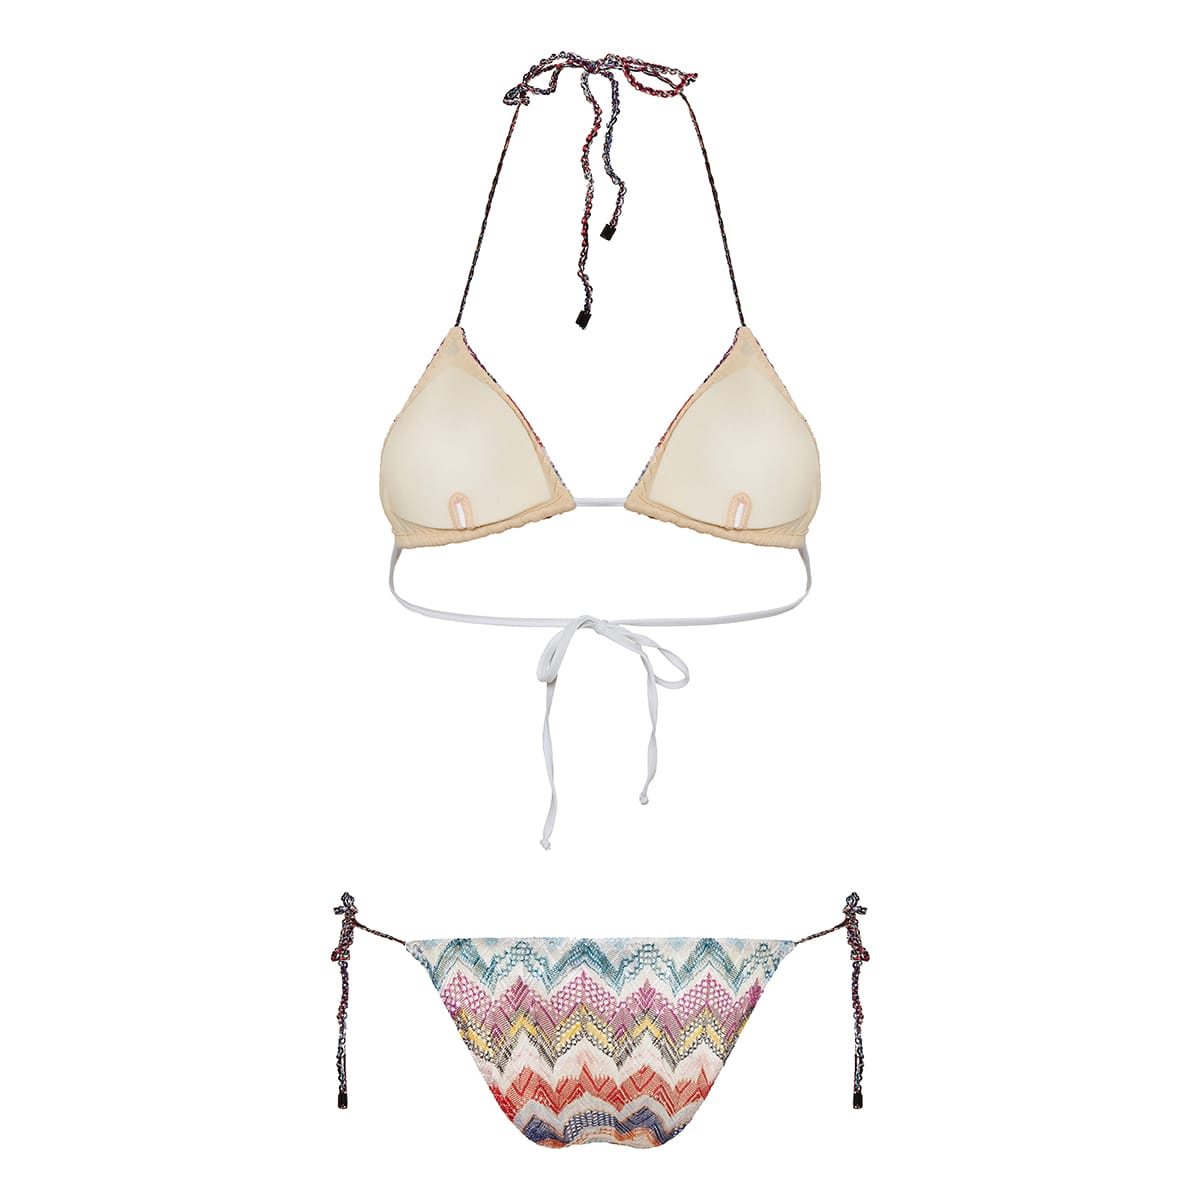 Chevron-knit triangle bikini